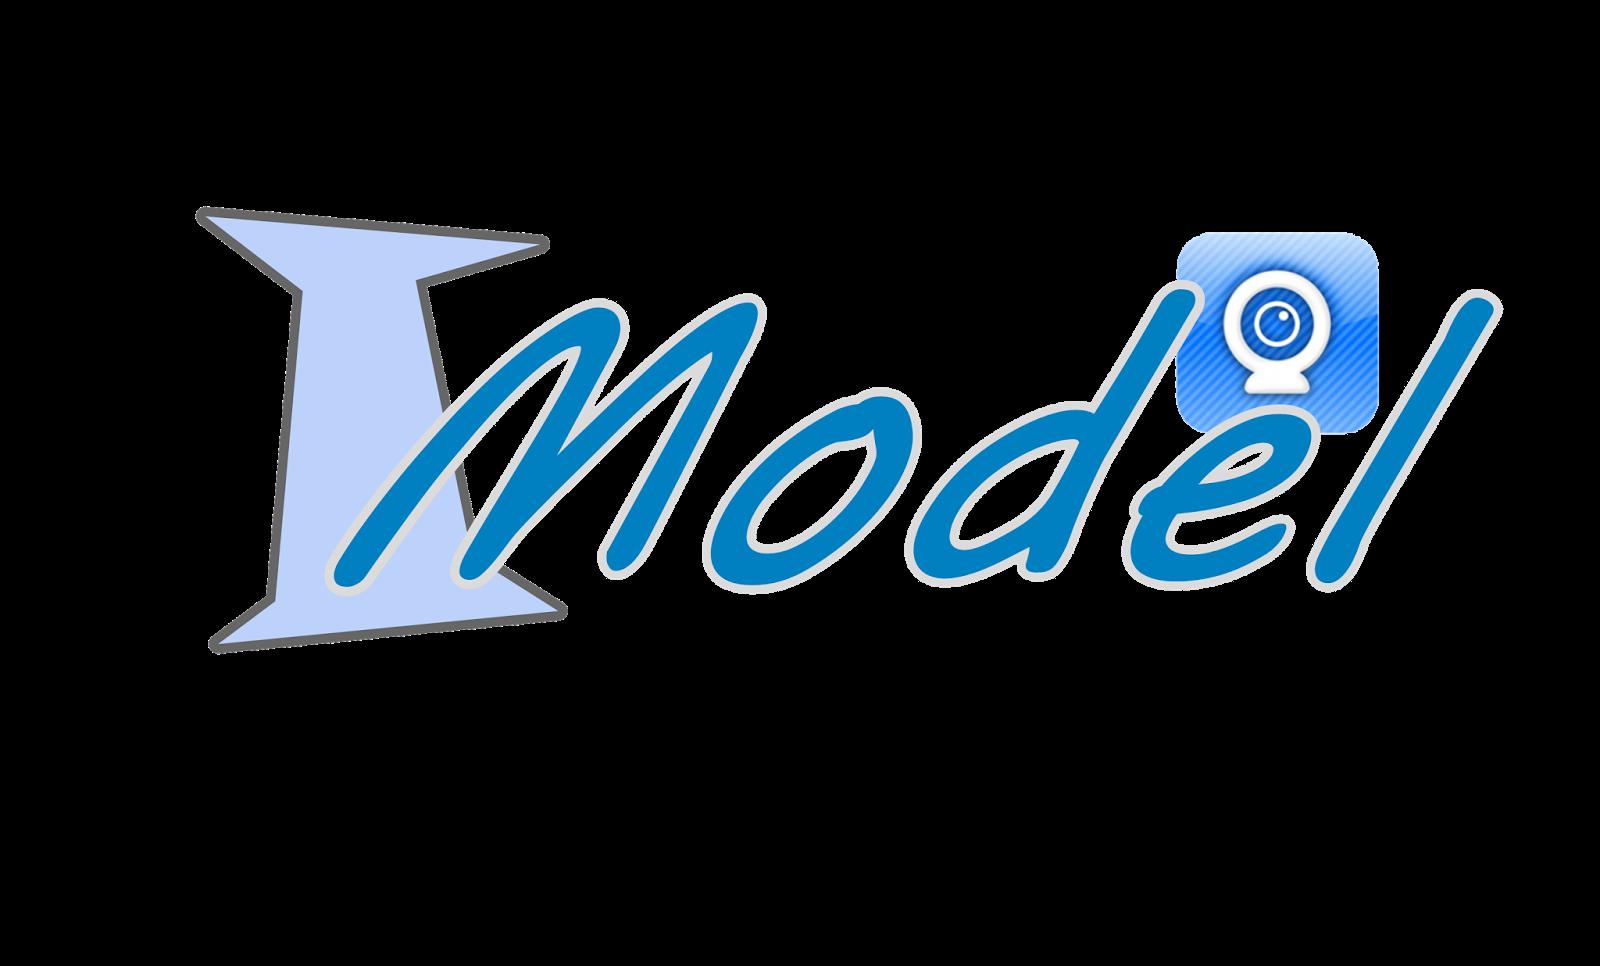 imodel%2Bfondo%2Bblanco  Prepagos Medellin - Escorts Medellin - Armenia, Modelos Web Cam